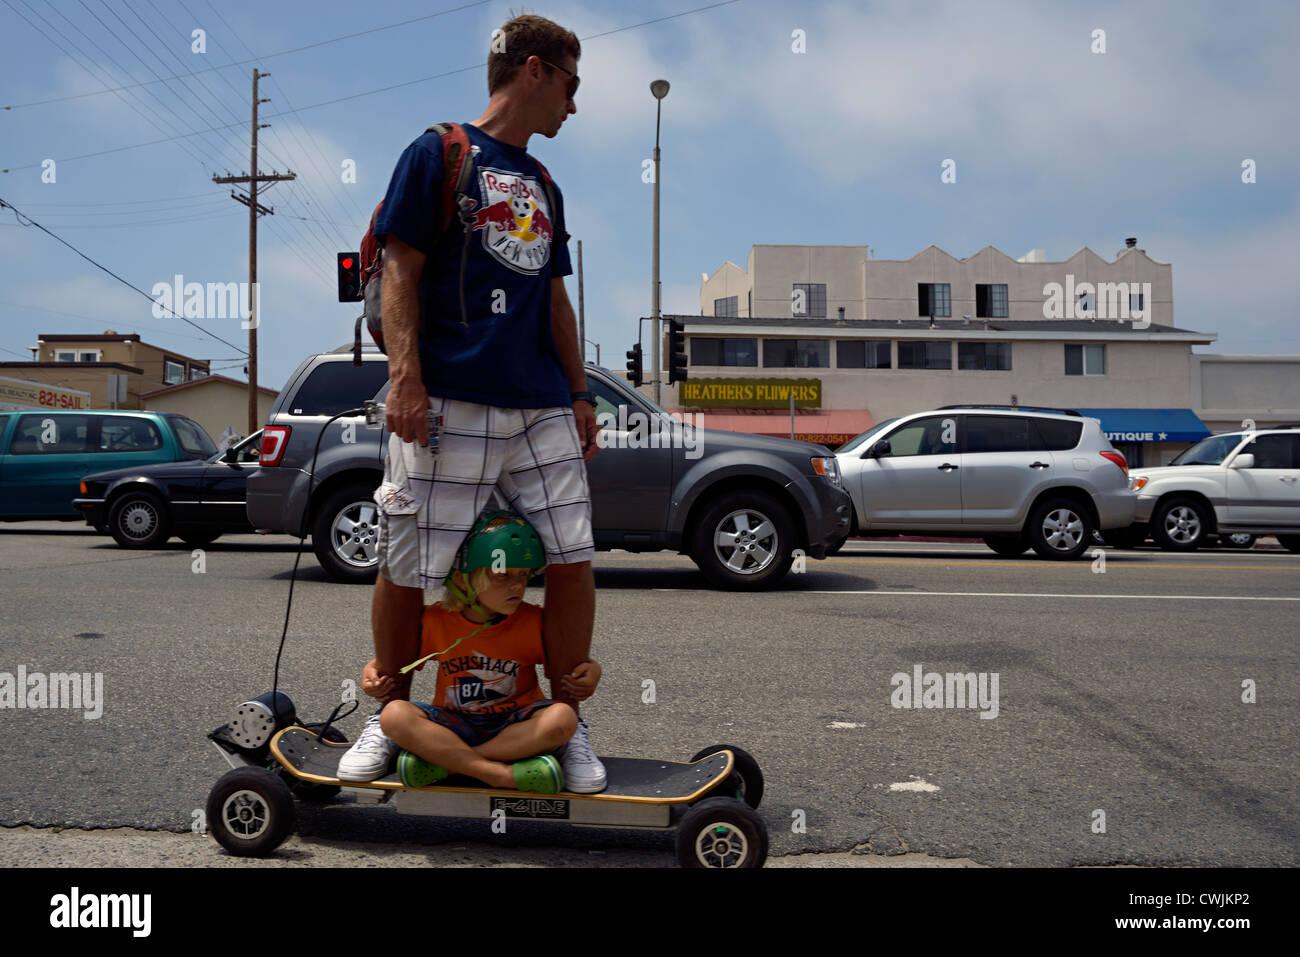 motorized skateboard venice beach california - Stock Image